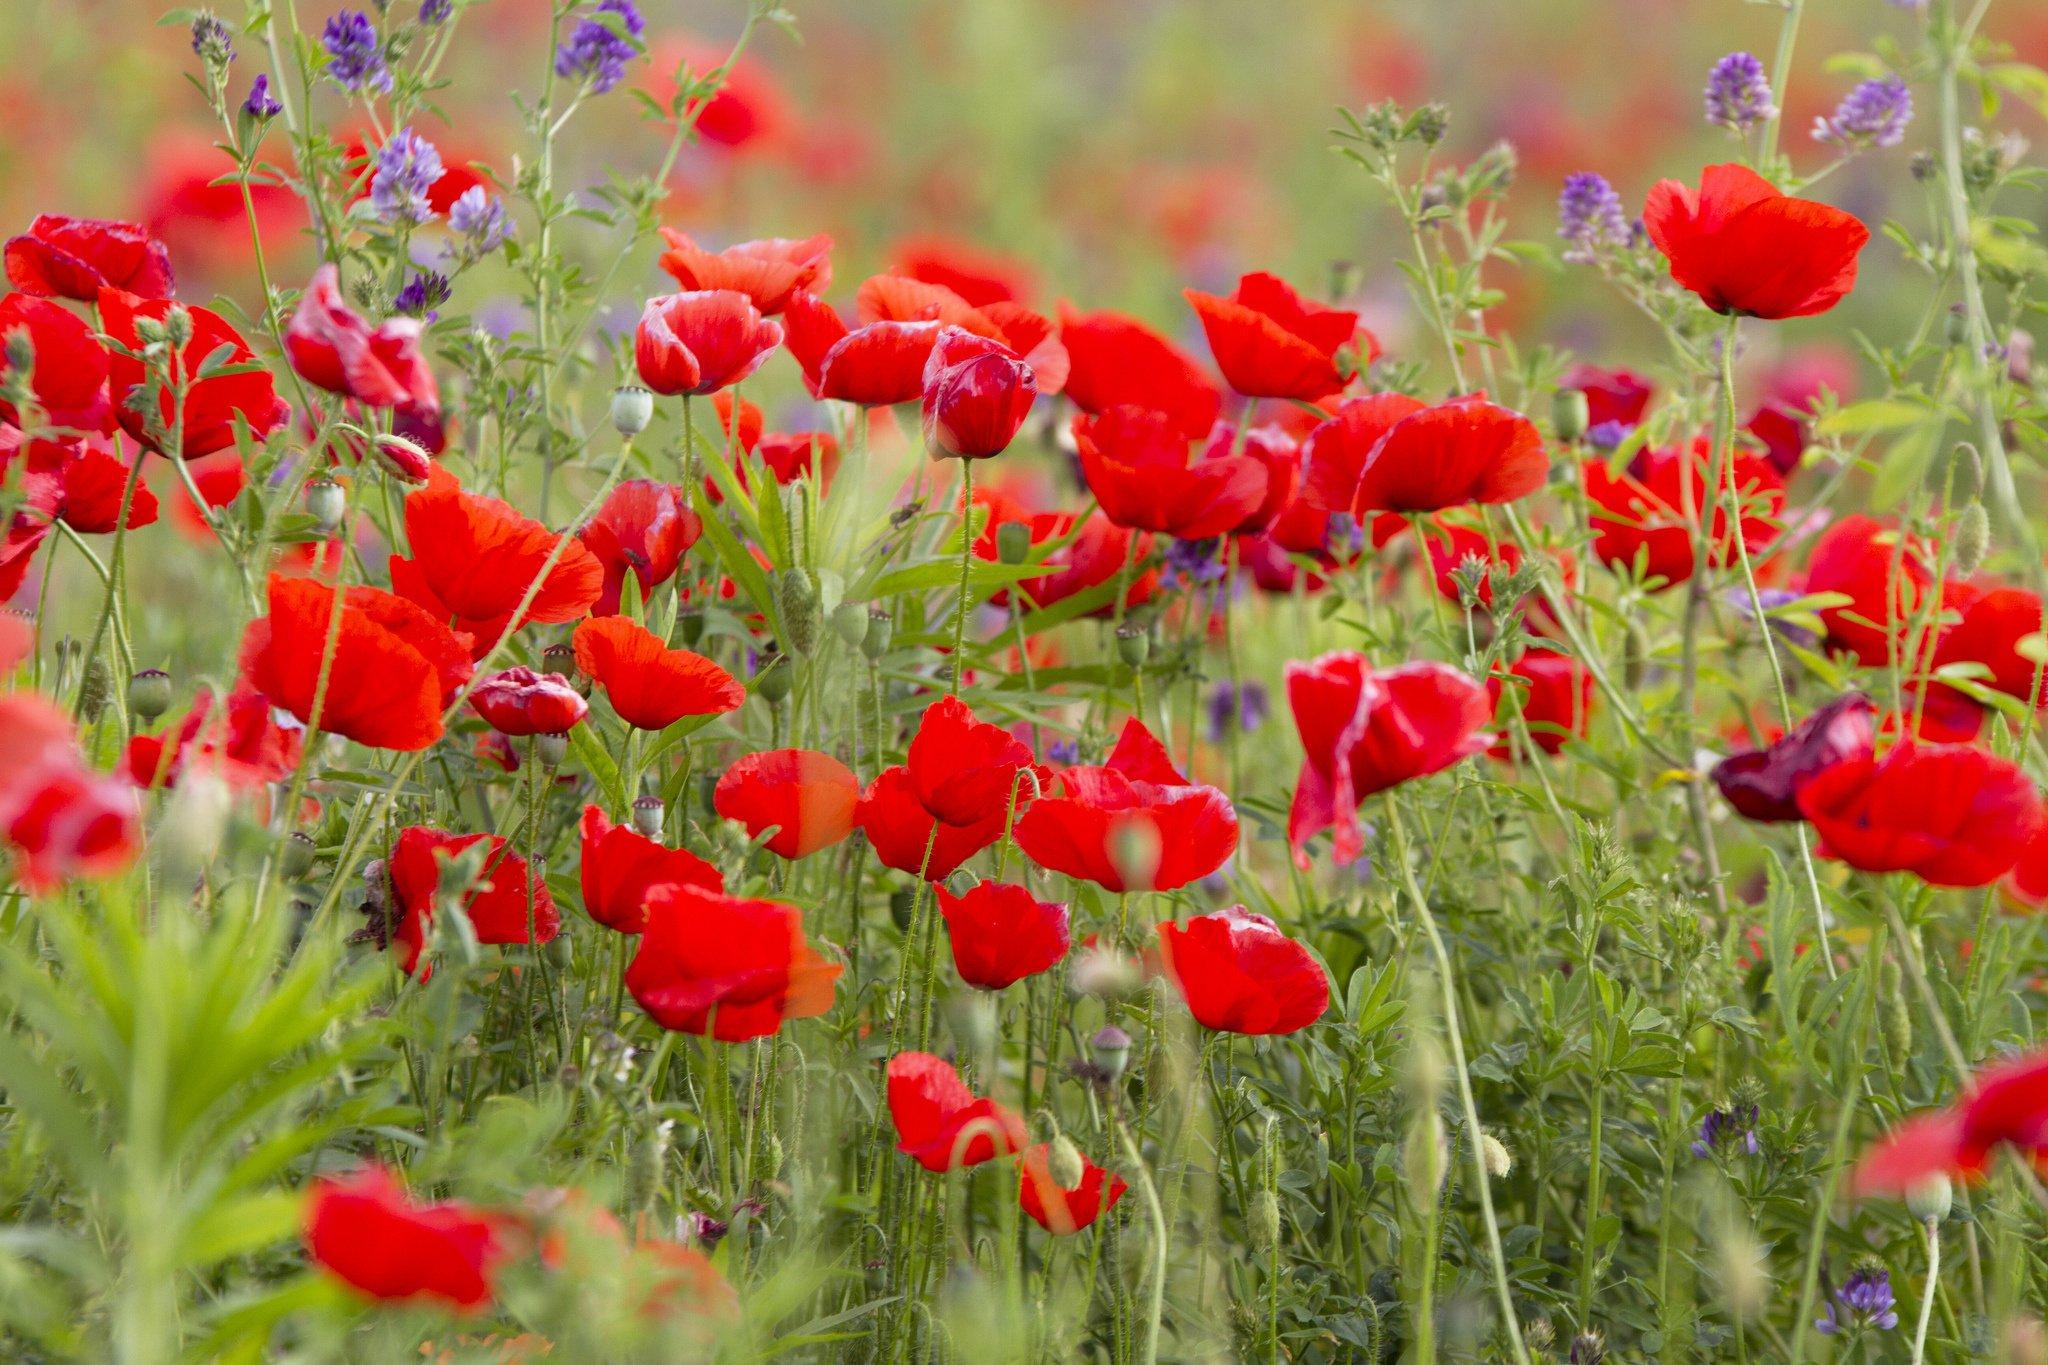 field poppies poppy wallpaper background 2048x1365